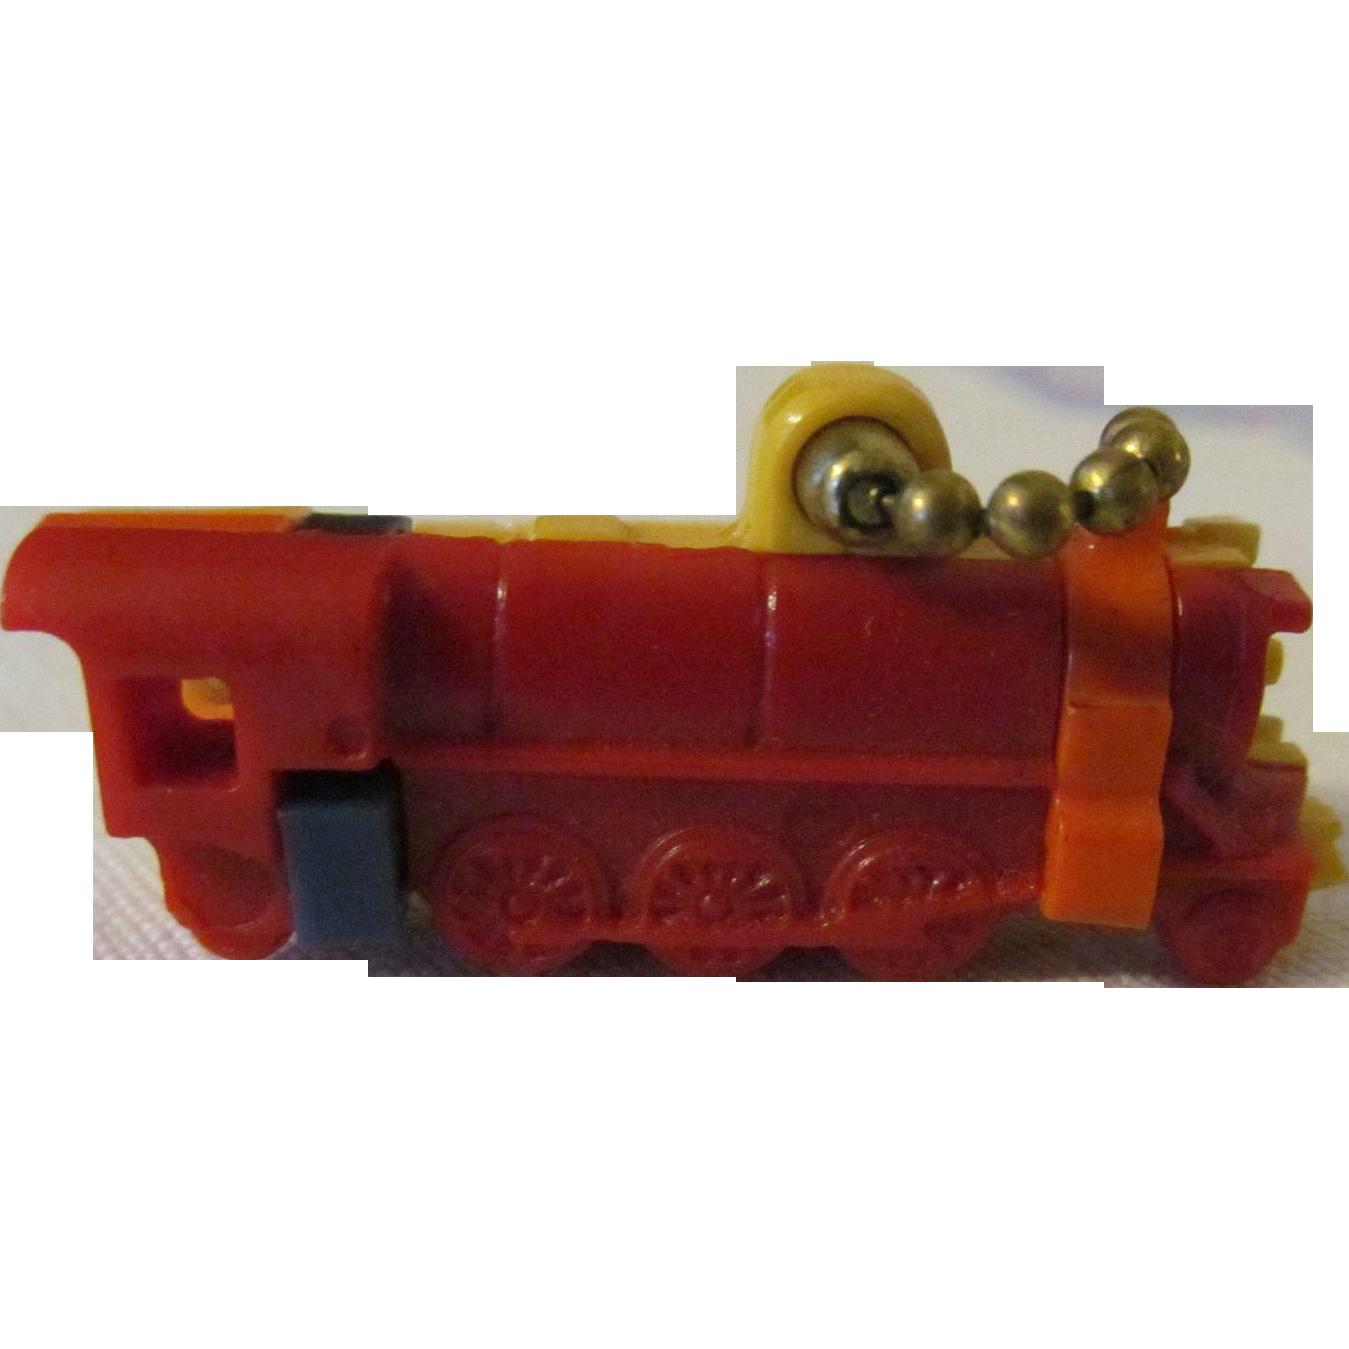 Railroad Train Engine Plastic Put Together Pull Apart ...